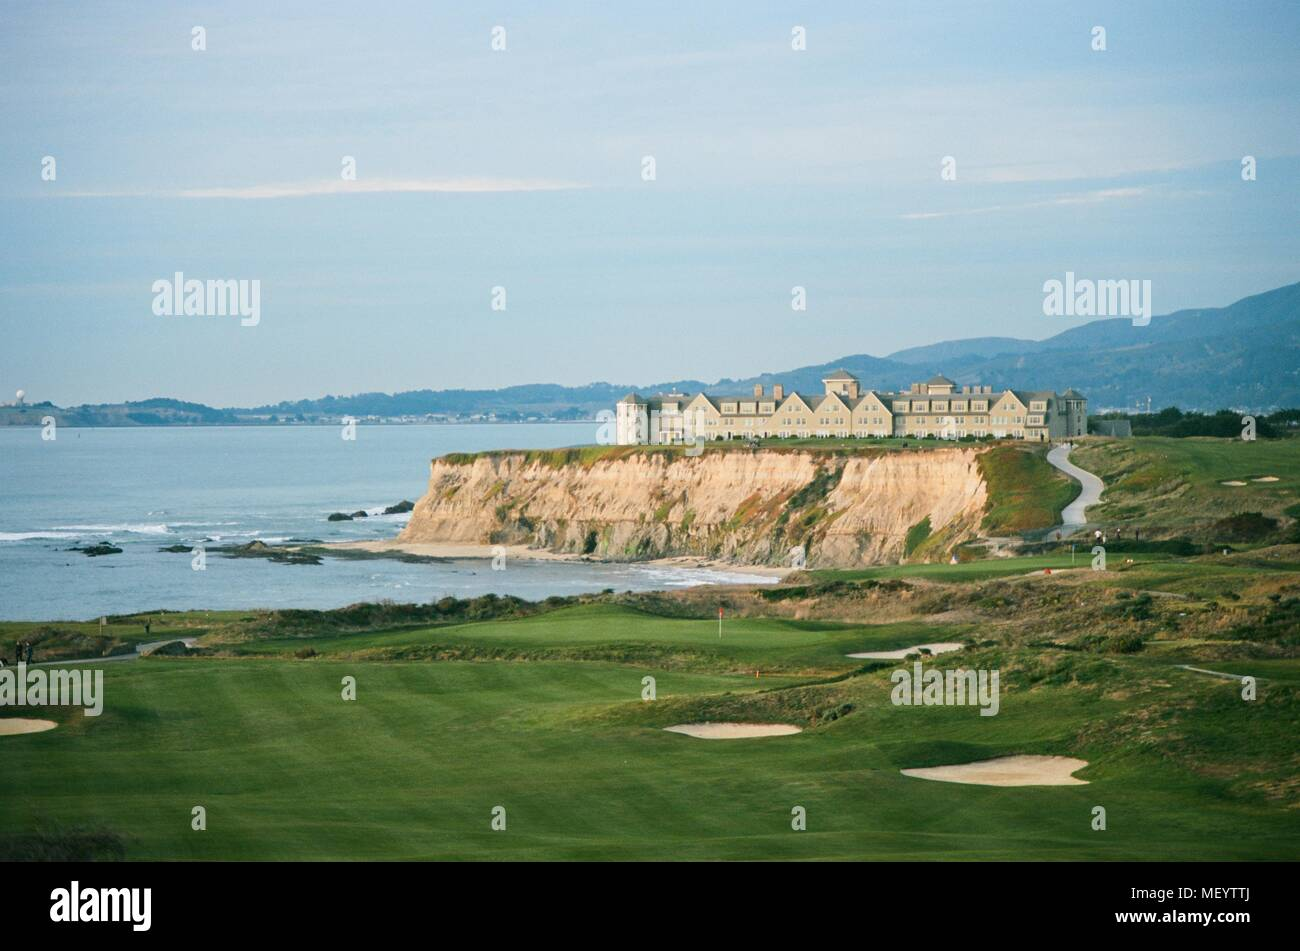 Ritz Carlton Half Moon Bay luxury hotel perched on sea cliffs with Half Moon Bay Golf Links golf course in foreground, Half Moon Bay, California, December 22, 2017. () - Stock Image